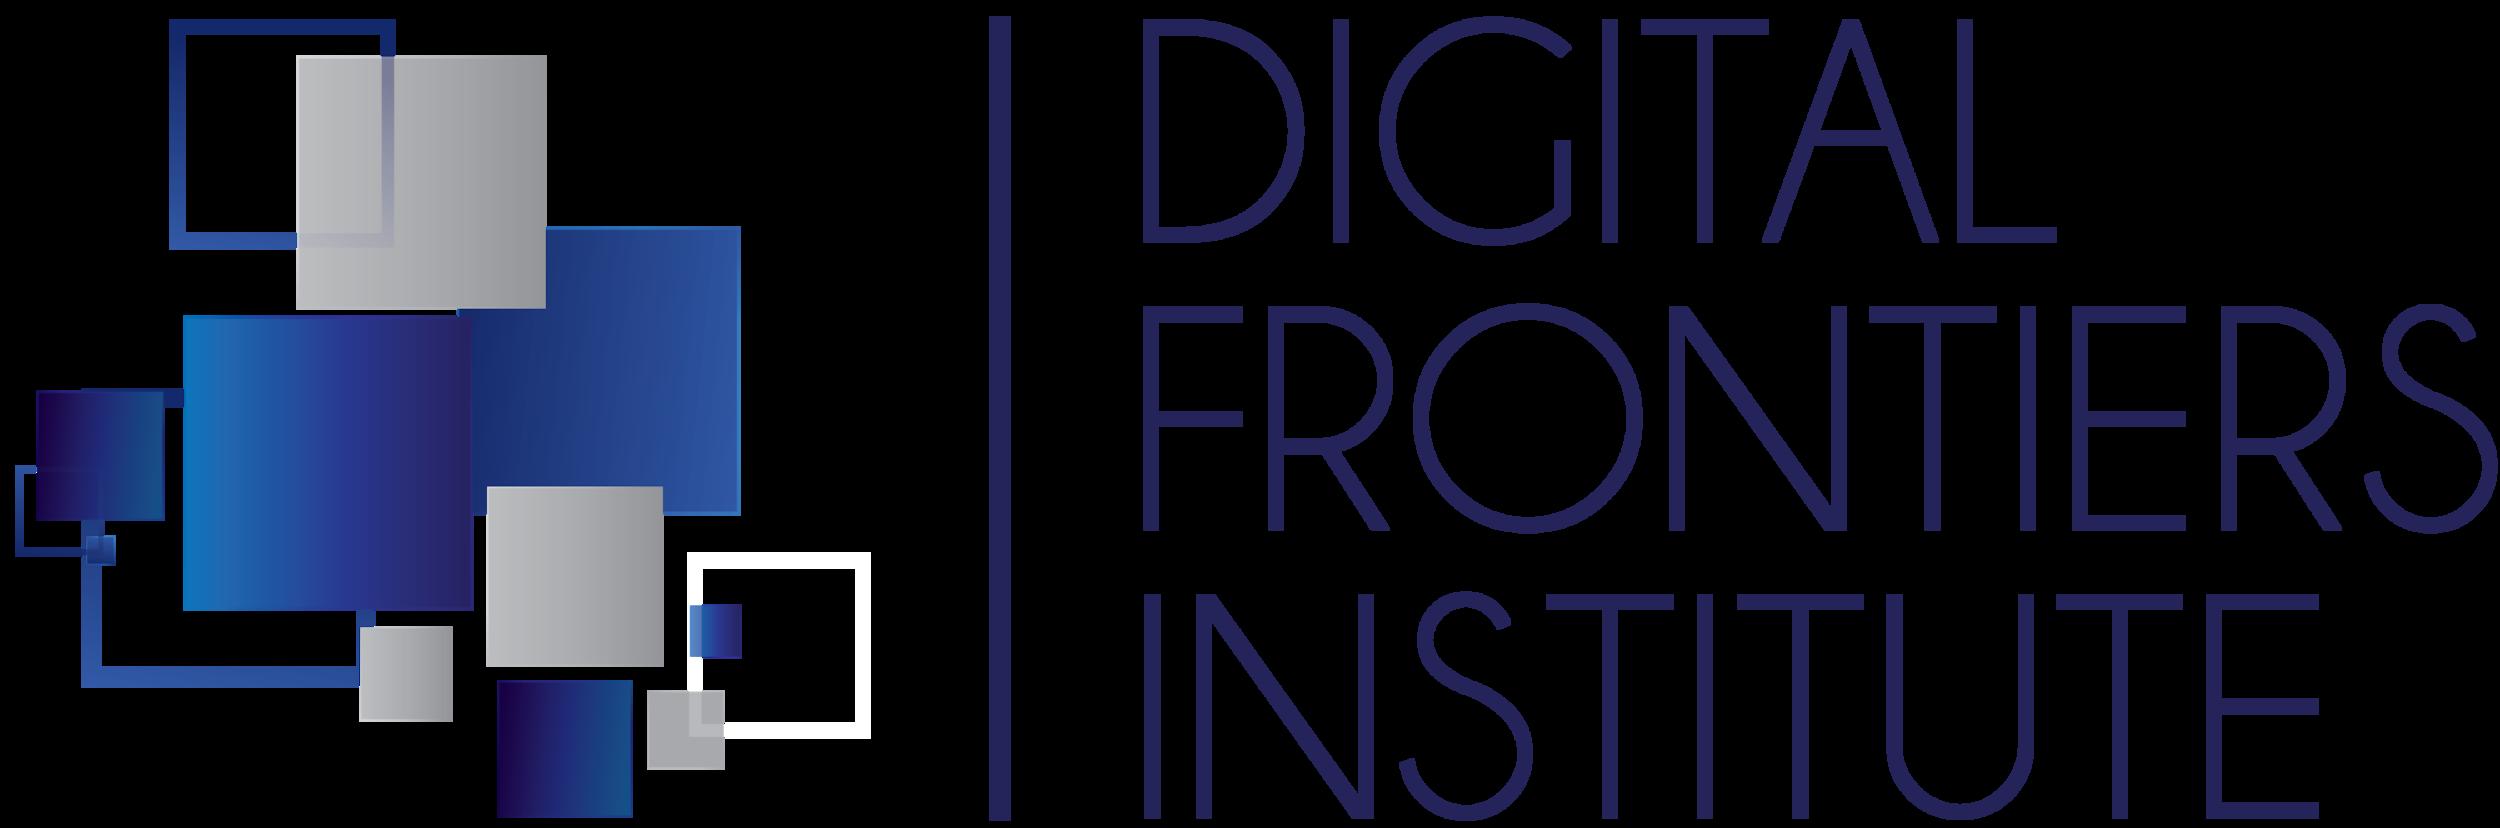 Digital Frontiers Institute Logo.png